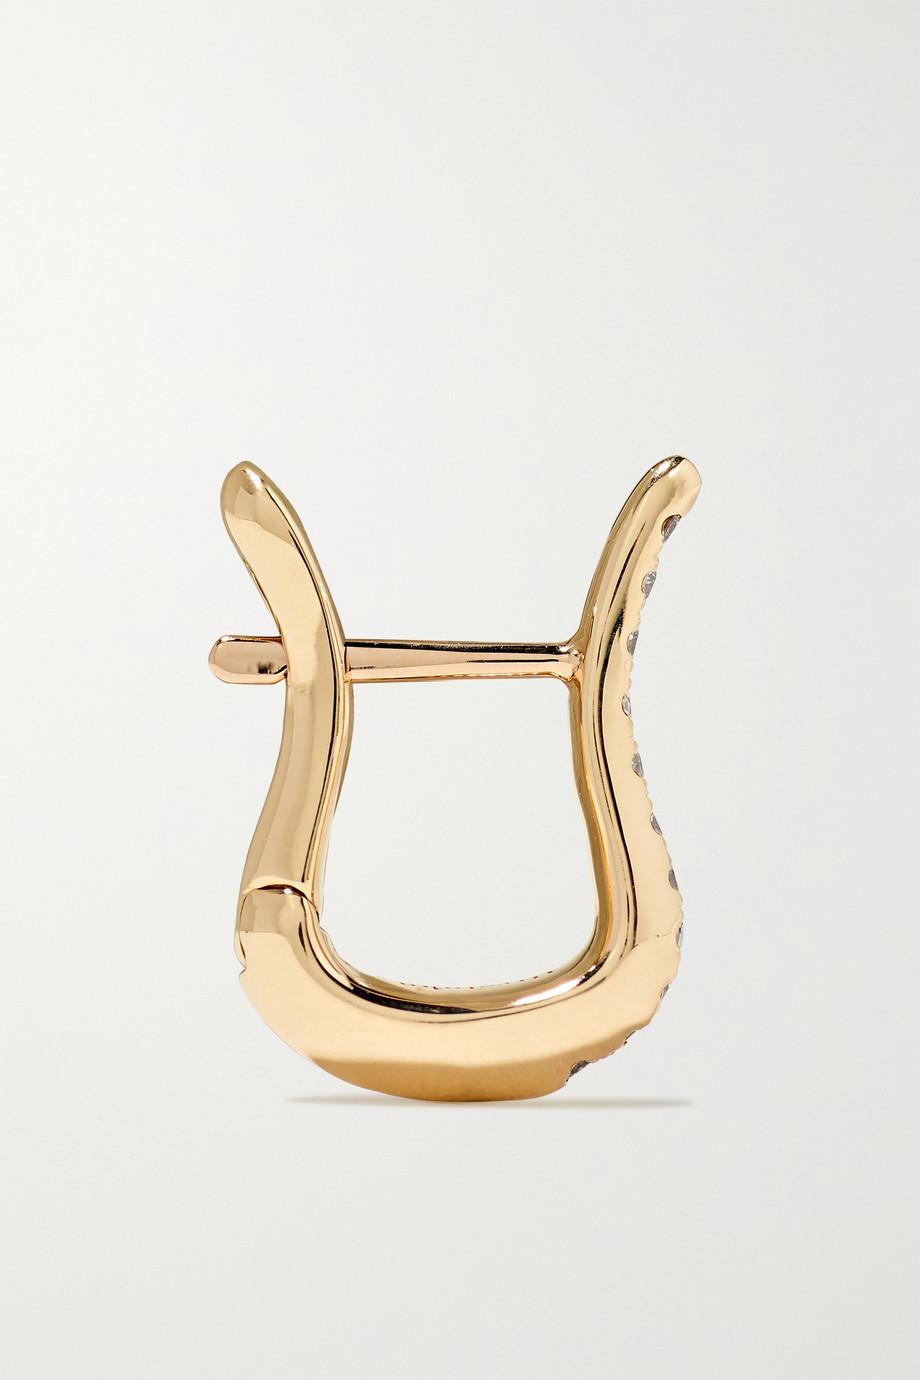 Hirotaka Cygnus 10-karat gold diamond hoop earring